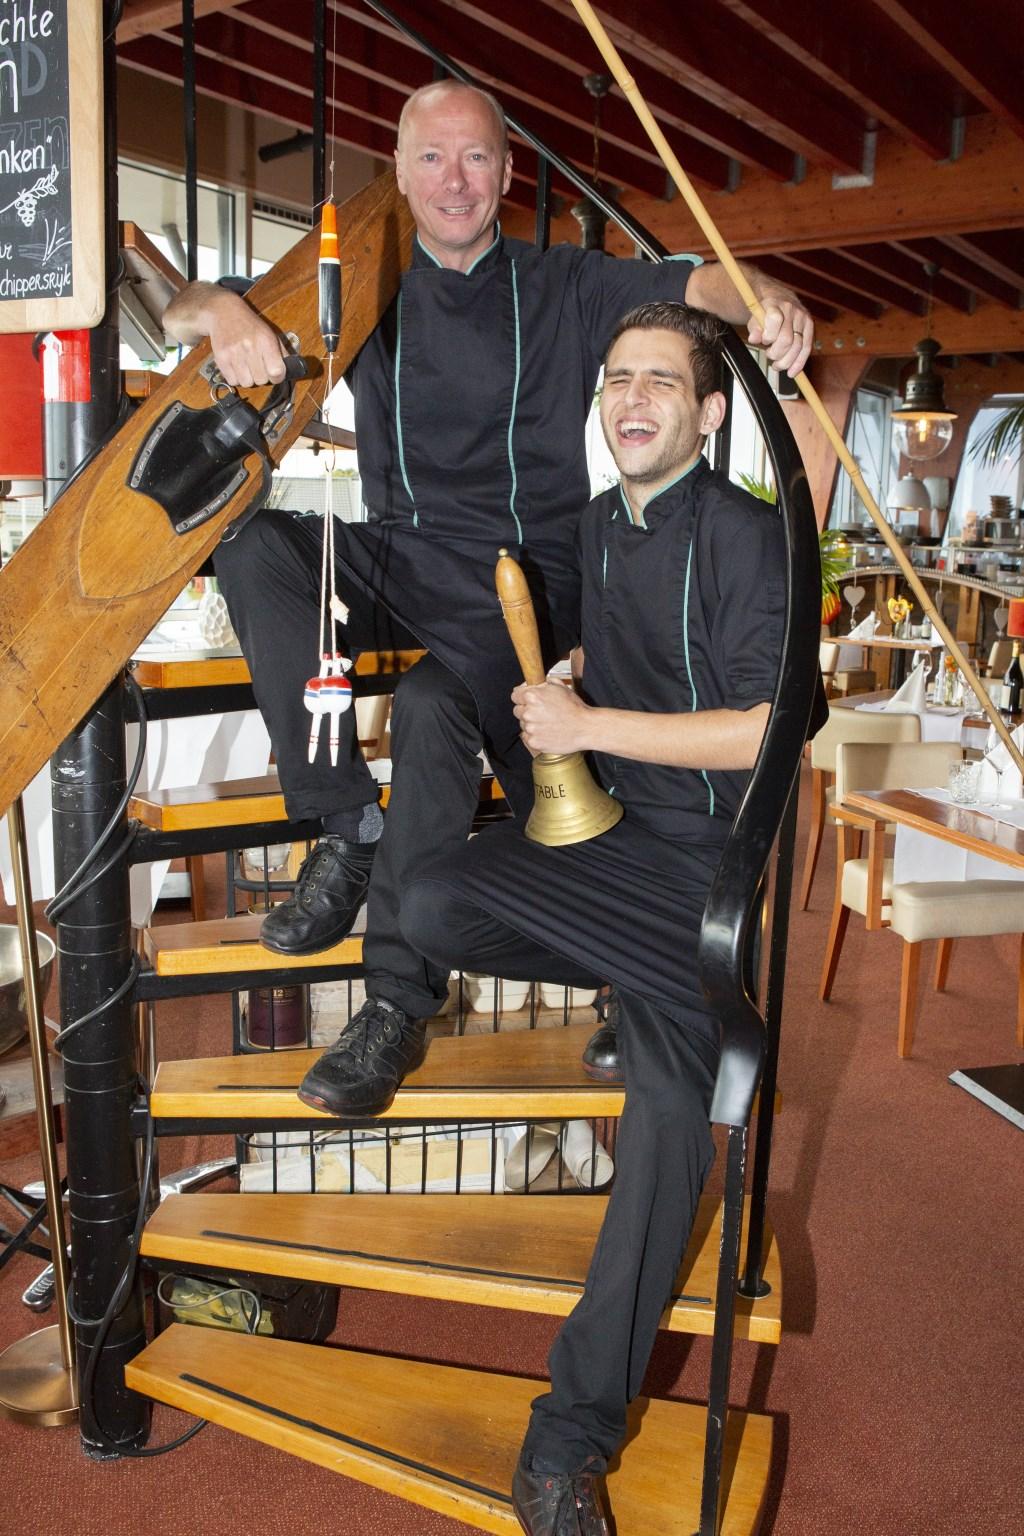 Foto: Chef-kok Remco en sous-chef Martijn © Uitkijkpost Media B.v.